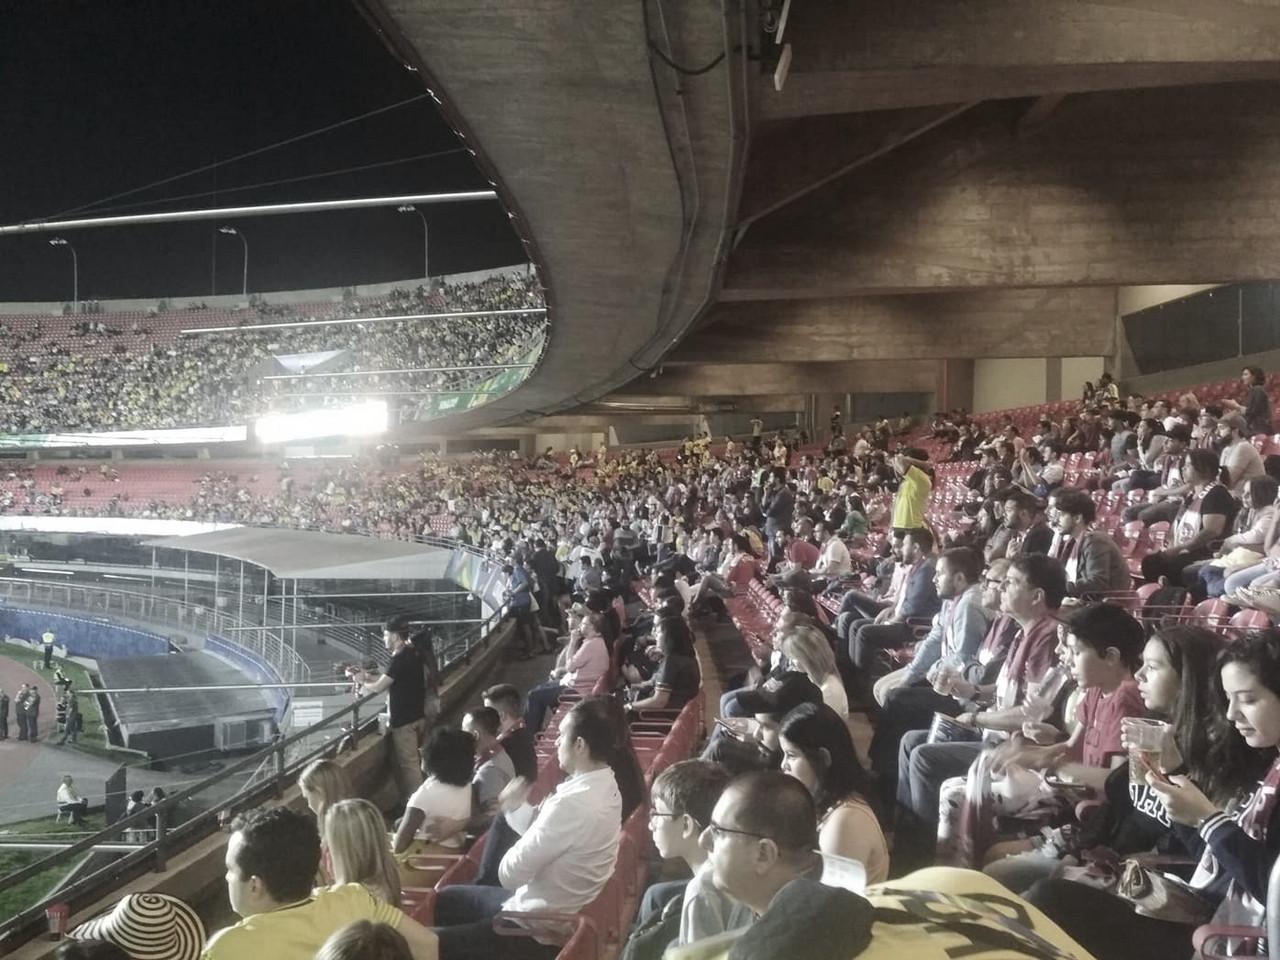 Convidado na Copa América, Catar é adotado pela torcida brasileira